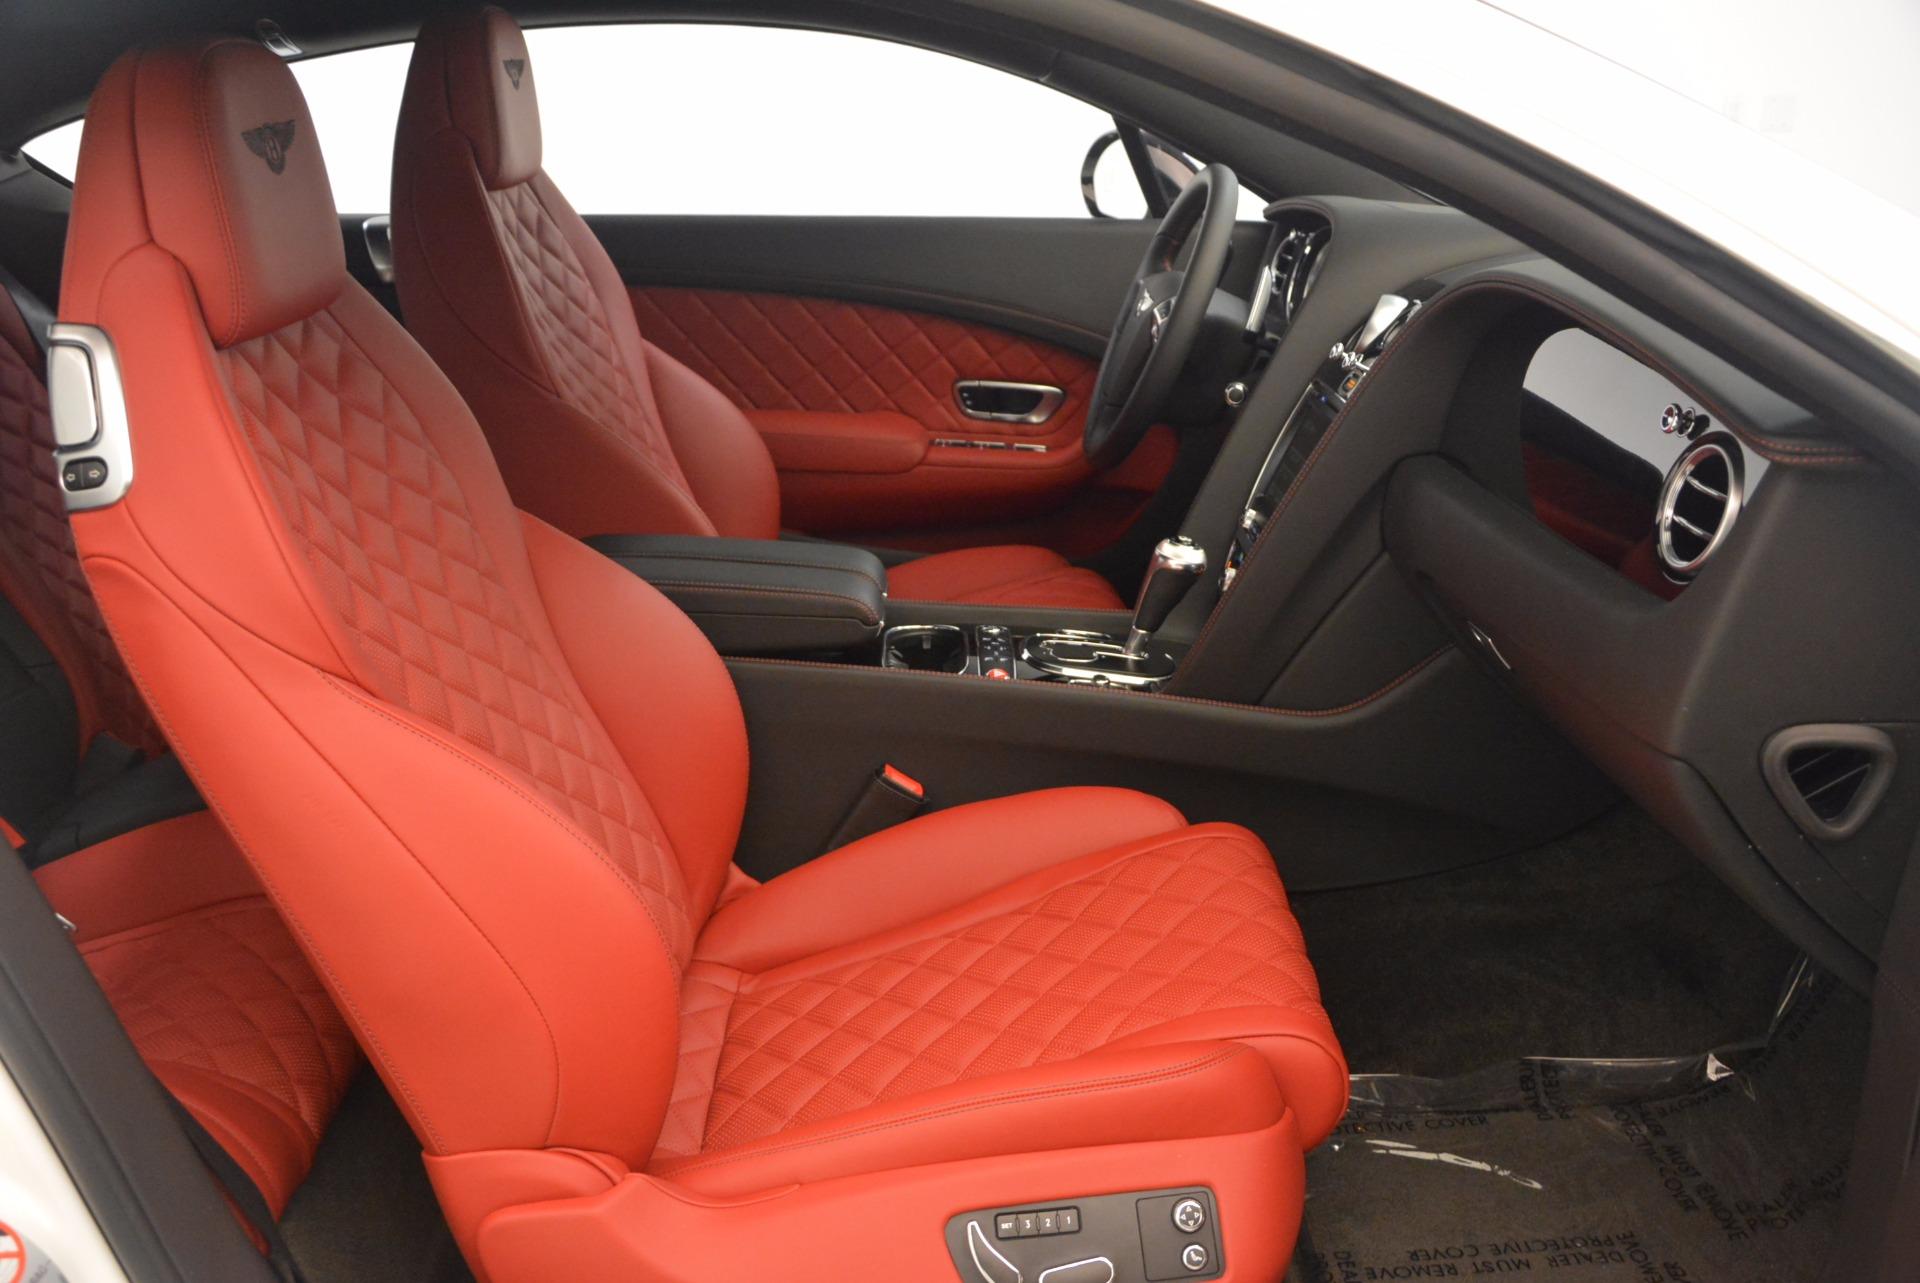 New 2017 Bentley Continental GT V8 S For Sale In Westport, CT 1384_p37